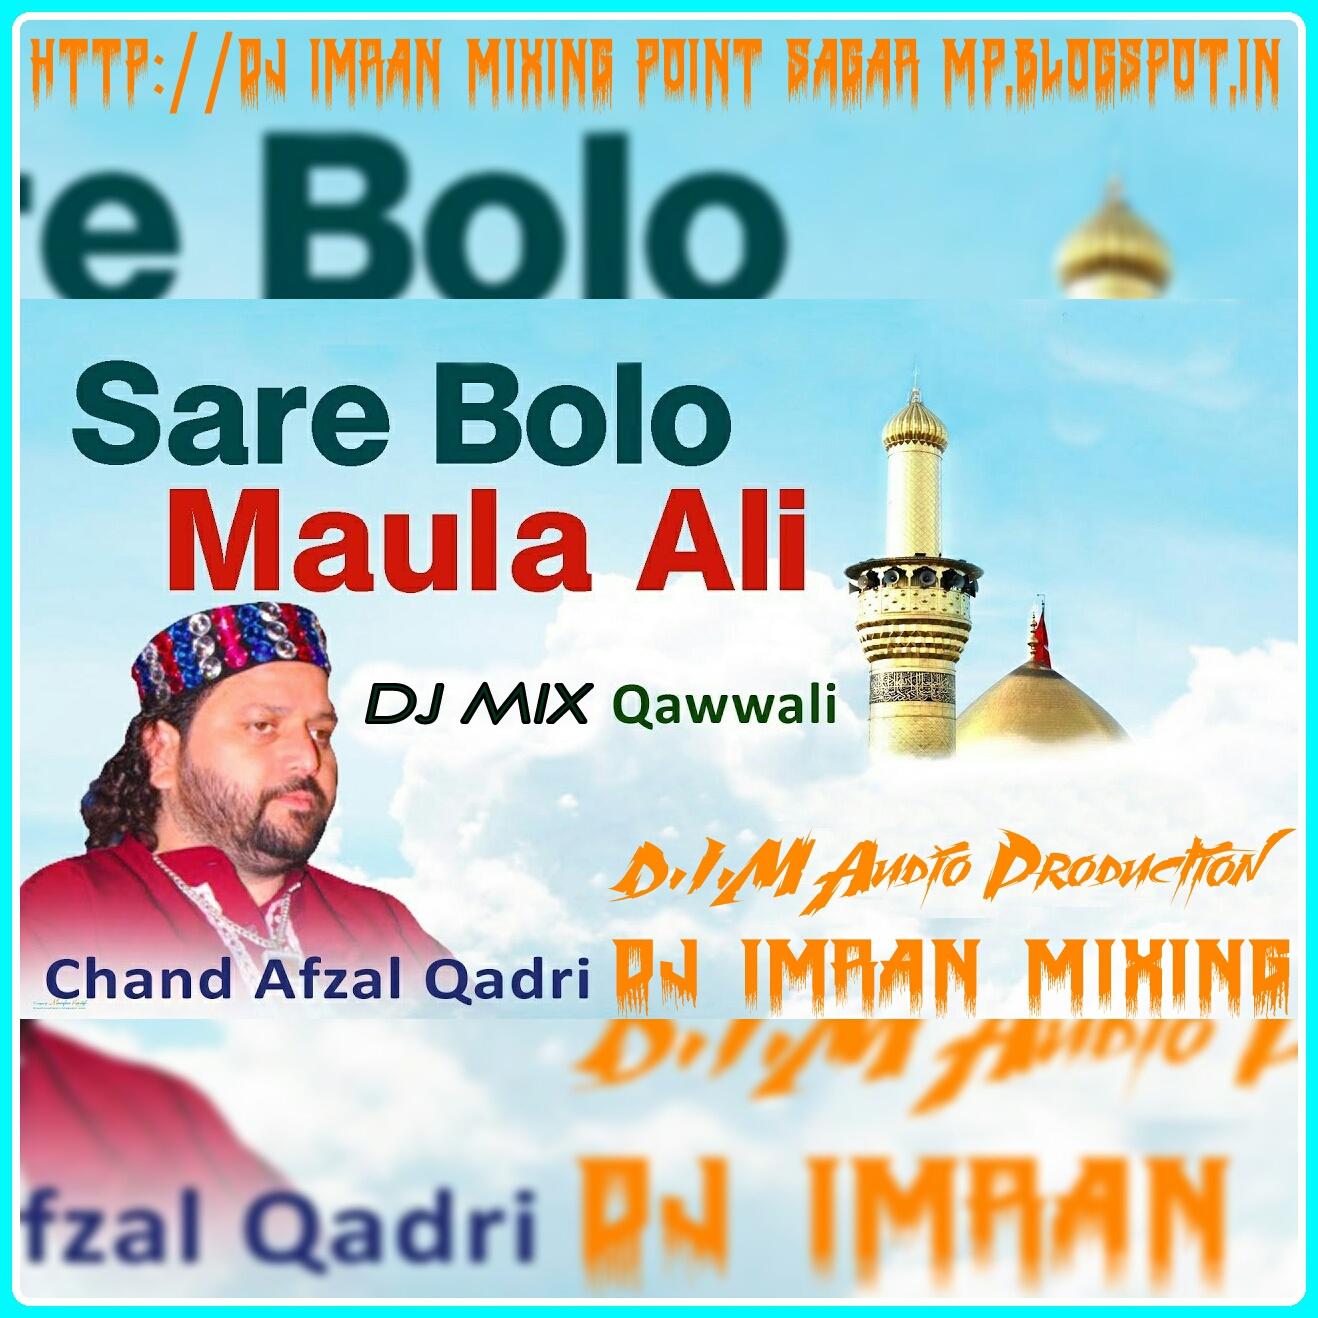 Imran Khan Song I Am Rider Mp3 Download: DJ Imran Mixing_D.I.M Audio Sagar M.P